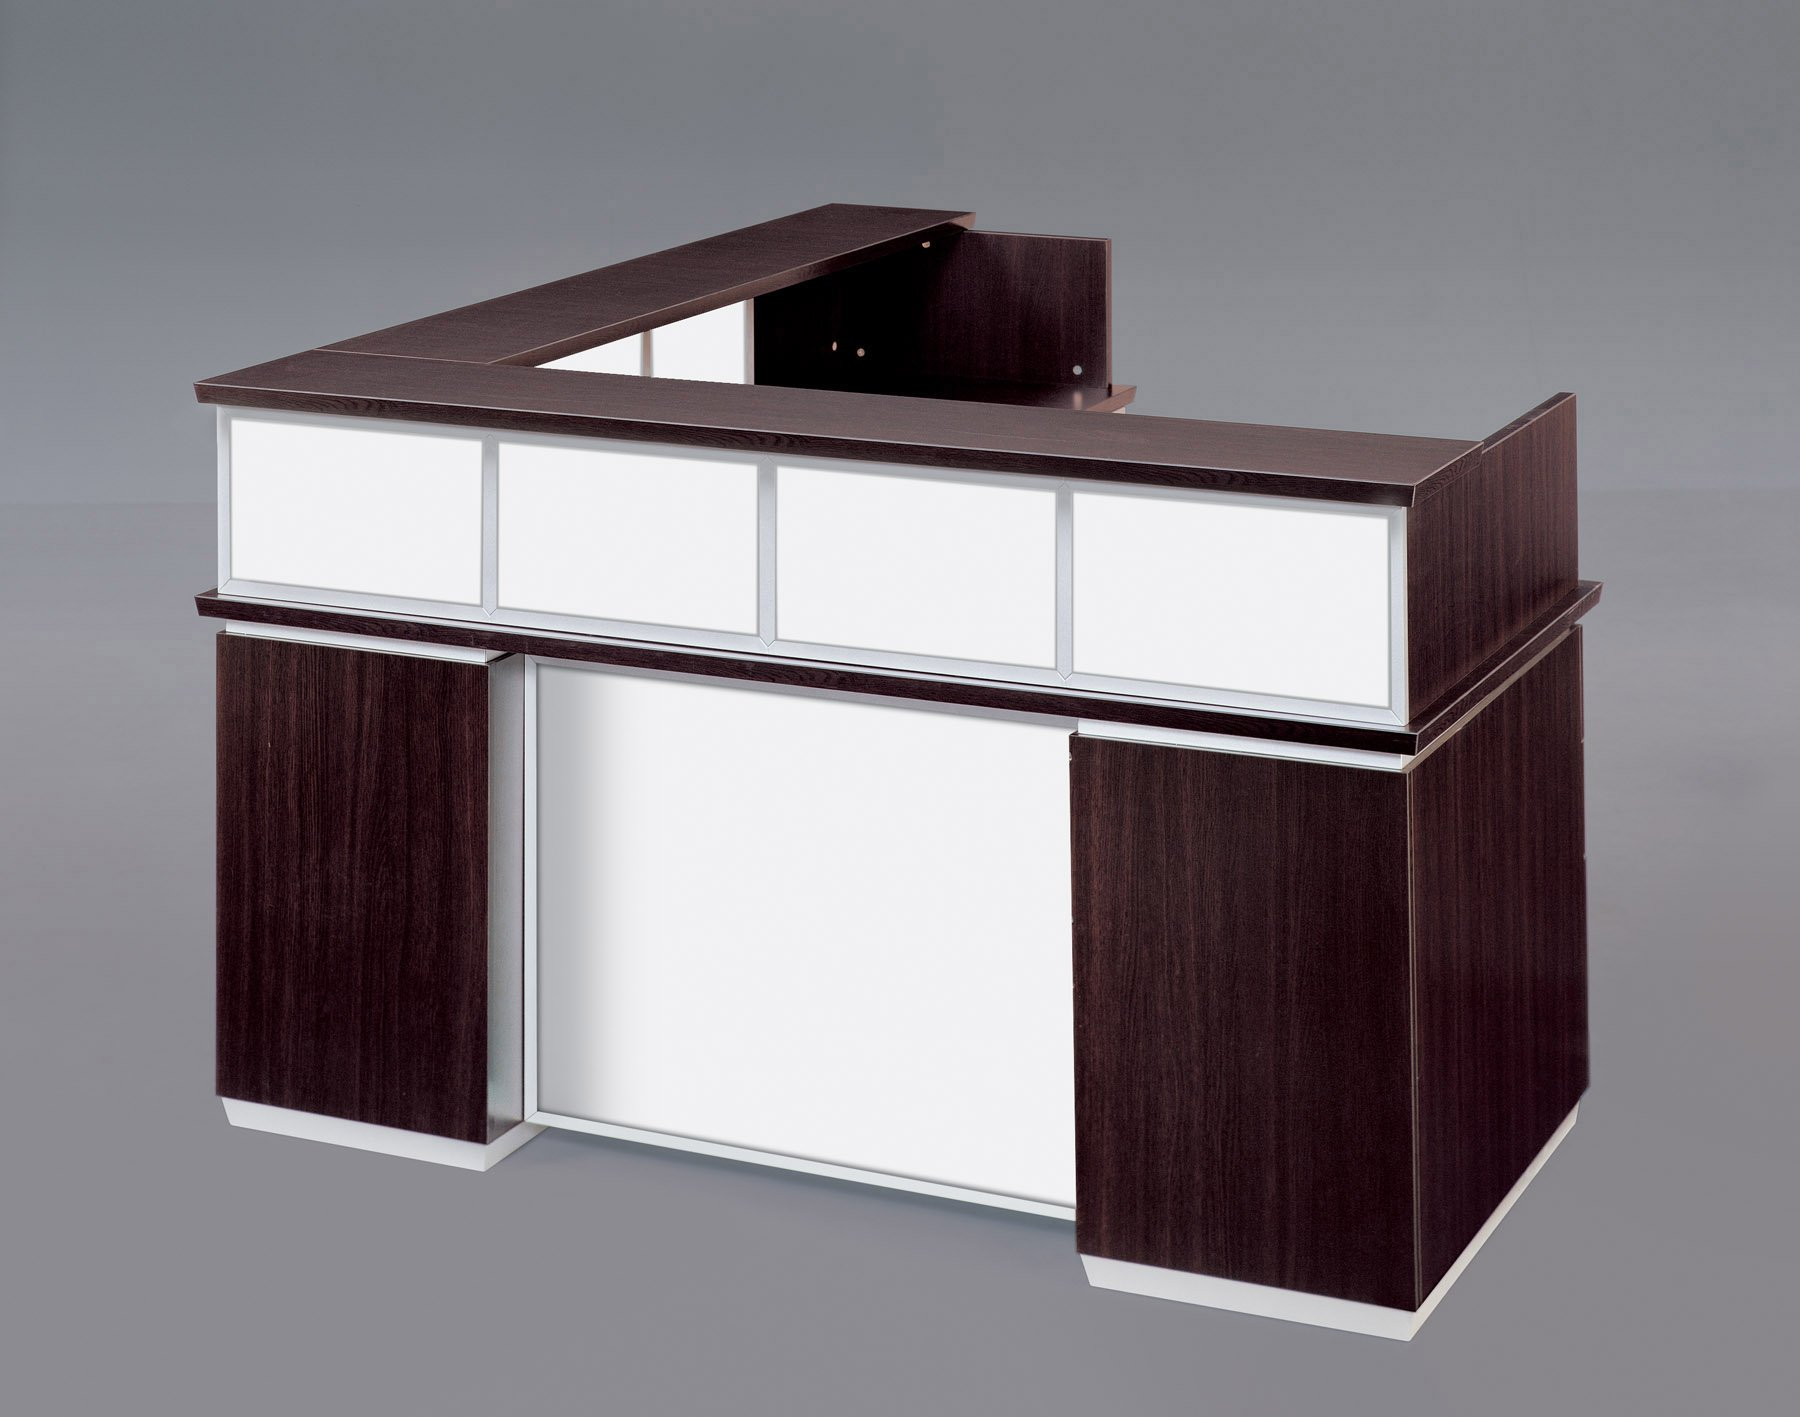 Flexsteel Pimlico  Right Reception L Desk with White Glass Modesty Panel